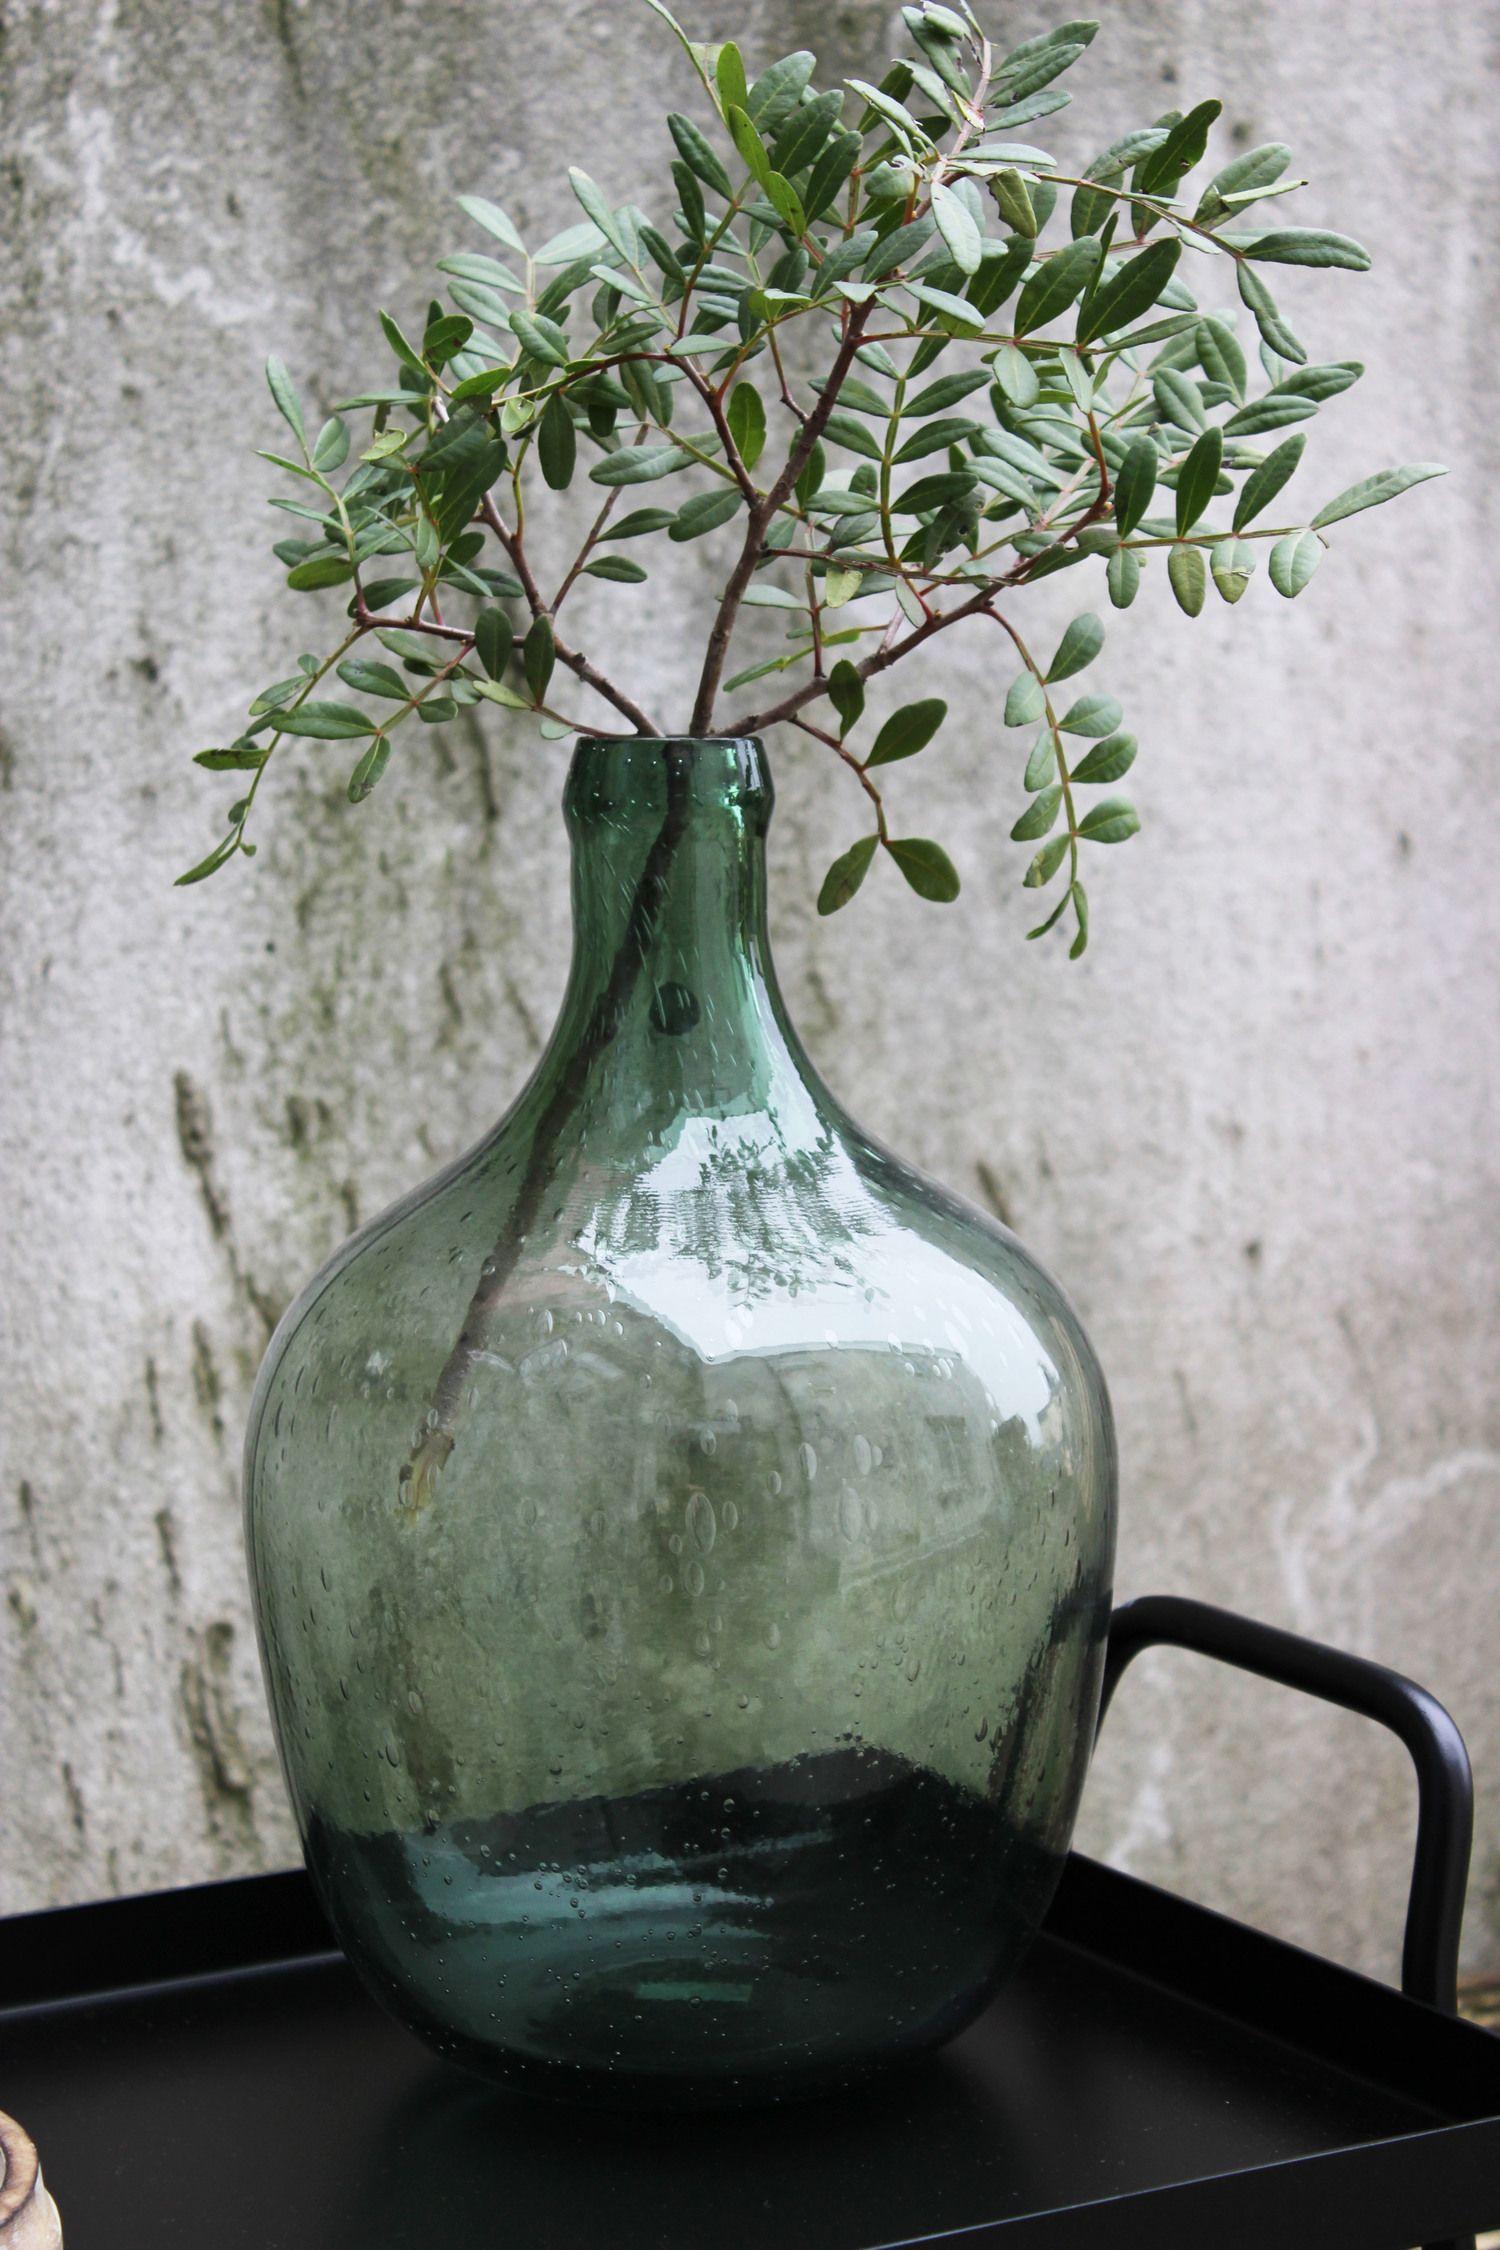 Green Glass Bottle Vase 34 Decoracion Con Damajuanas Vidrio